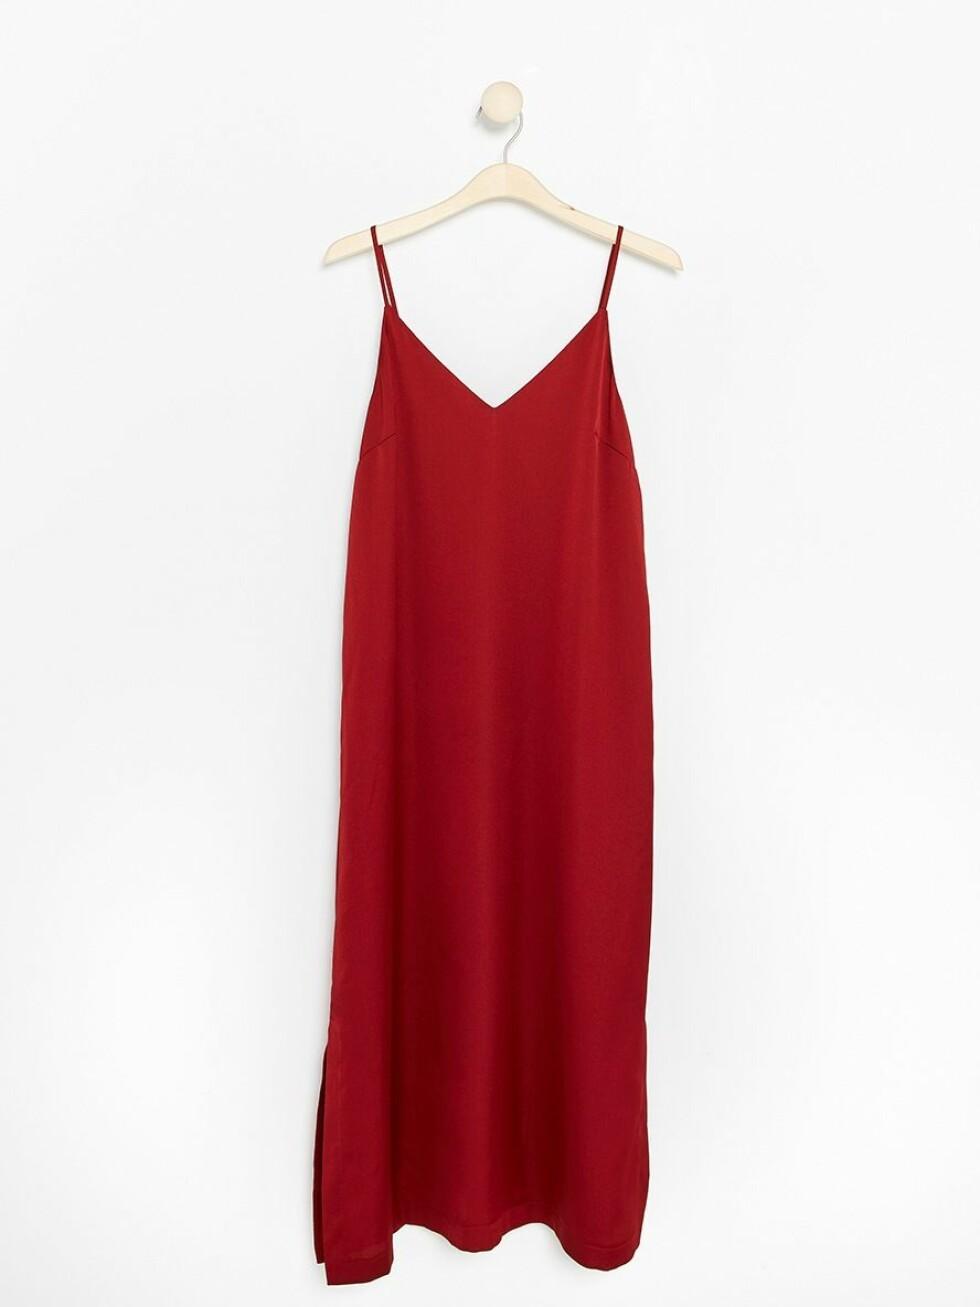 Kjole fra Lindex |299,-| https://www.lindex.com/no/dame/overdeler/kjoler/7801956/Ermeloes-kjole/